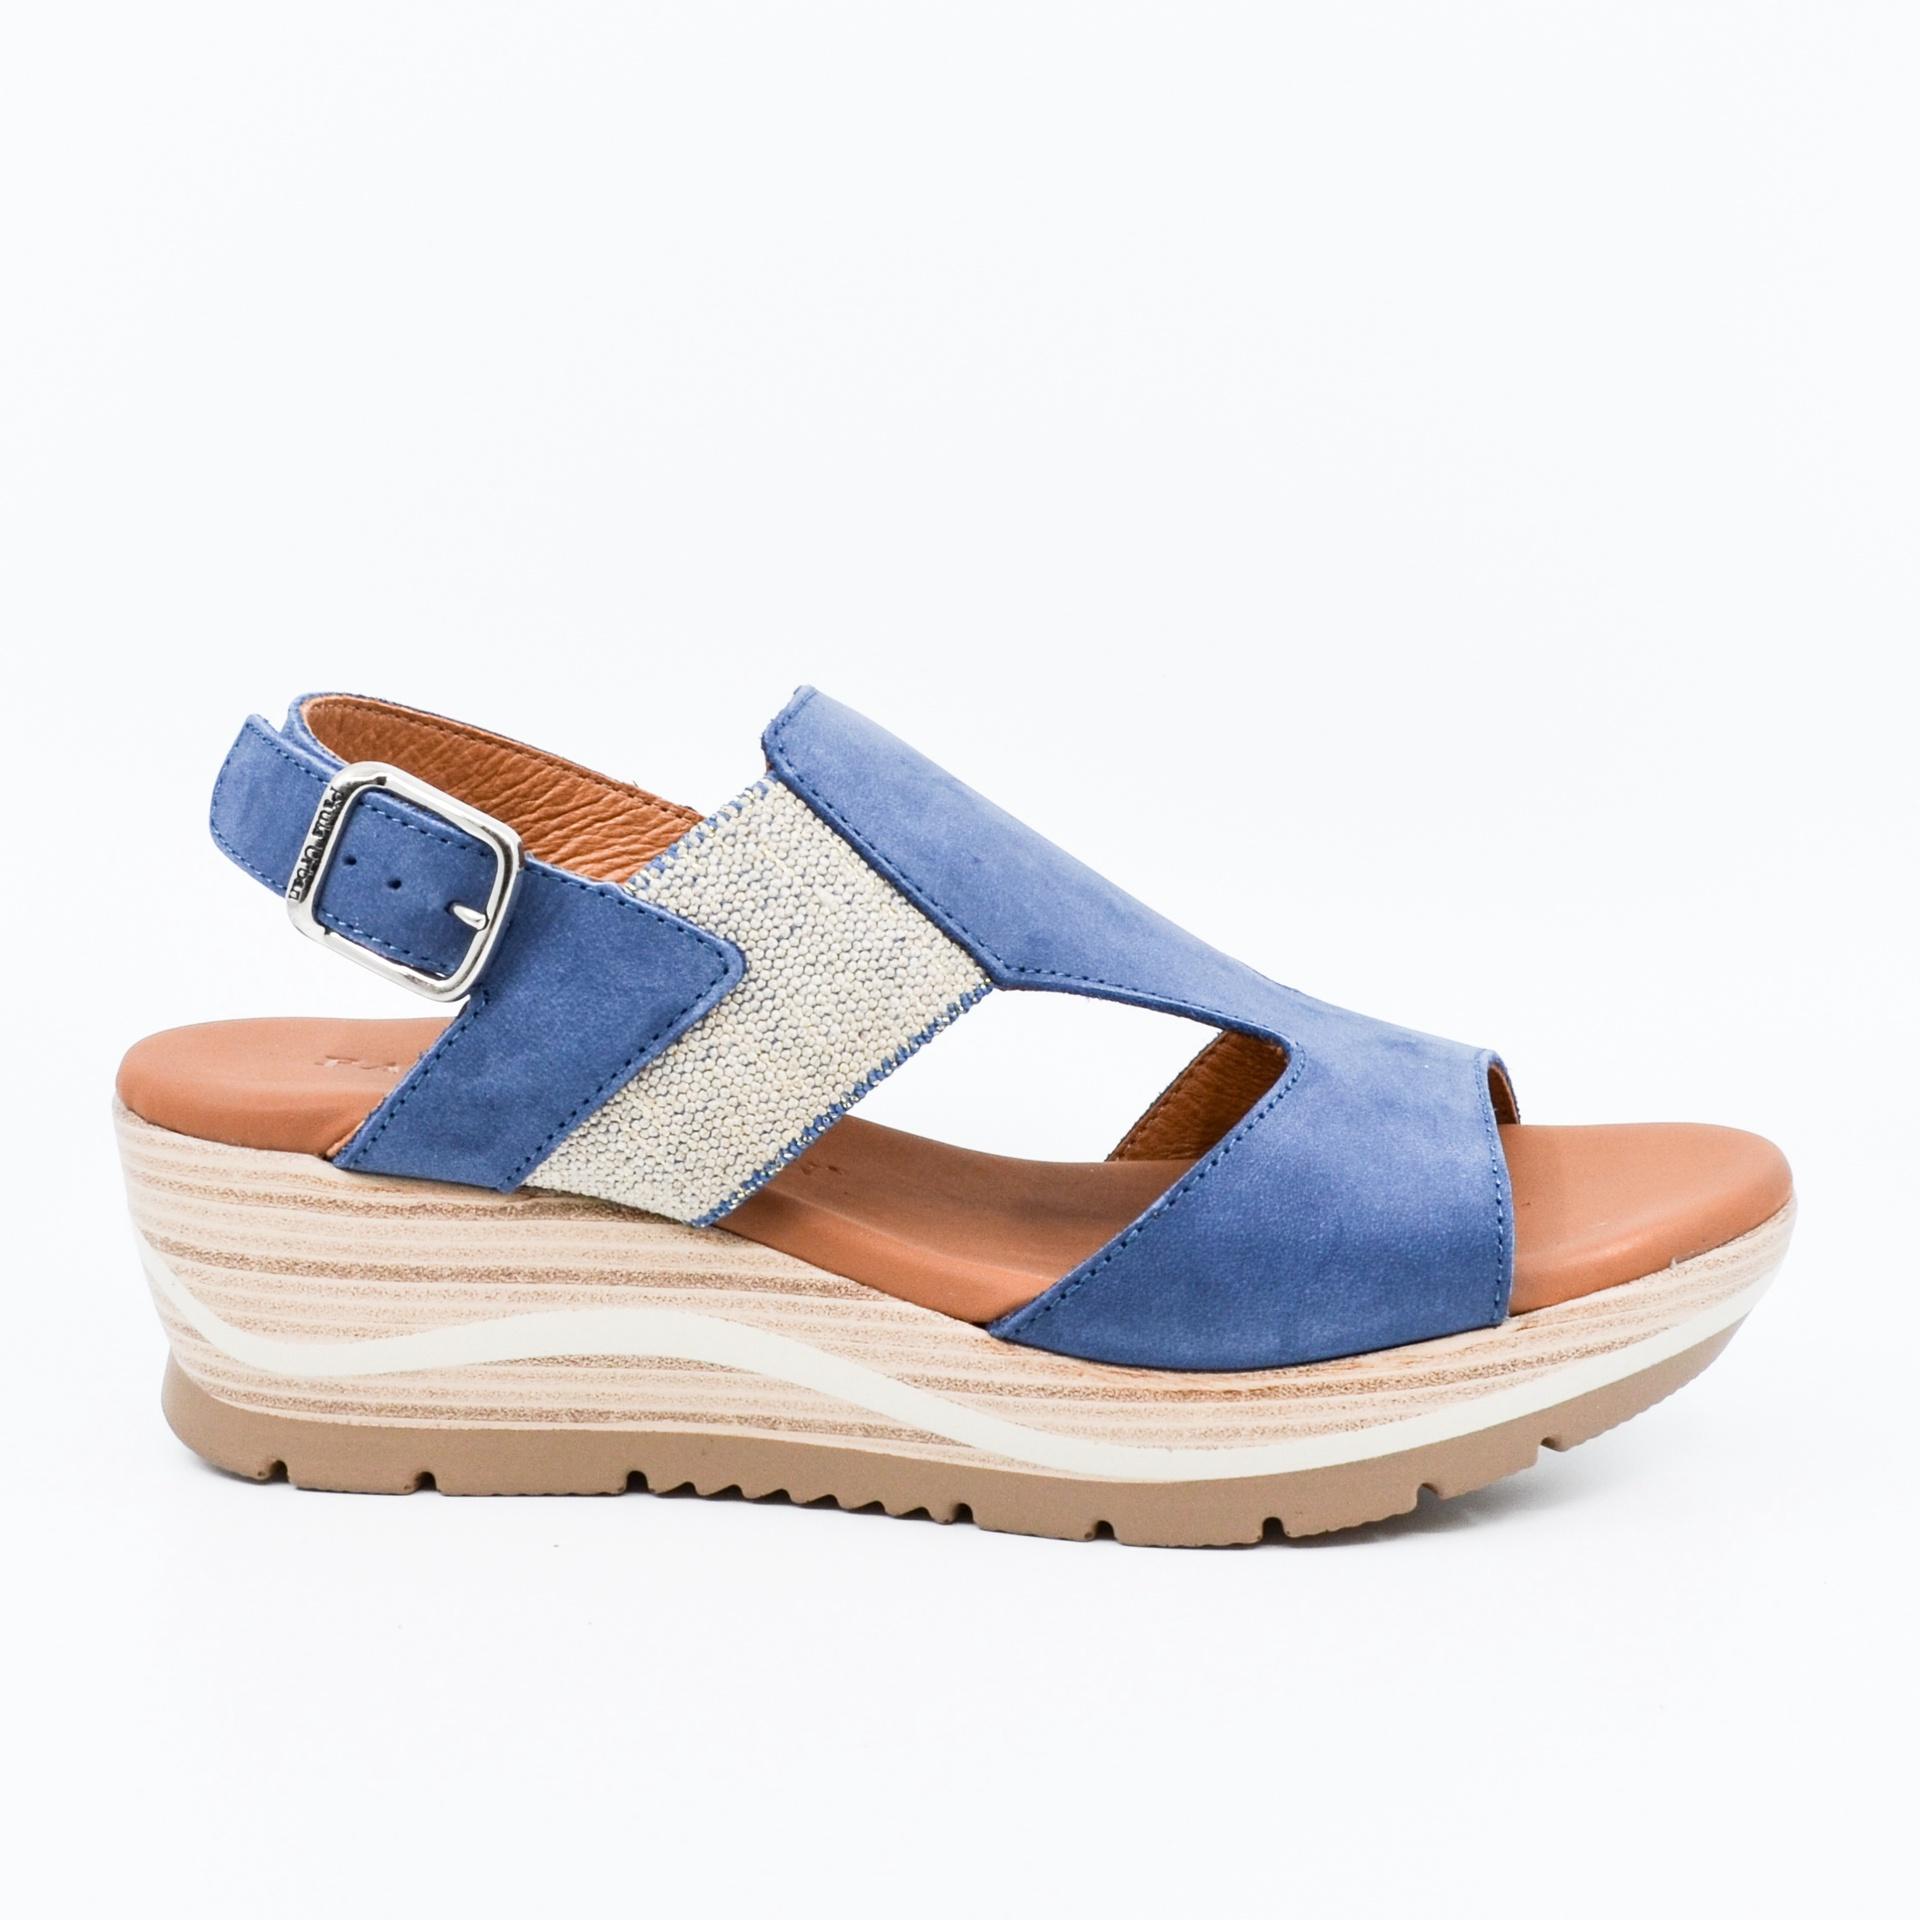 Paula Urban 1-47 blue